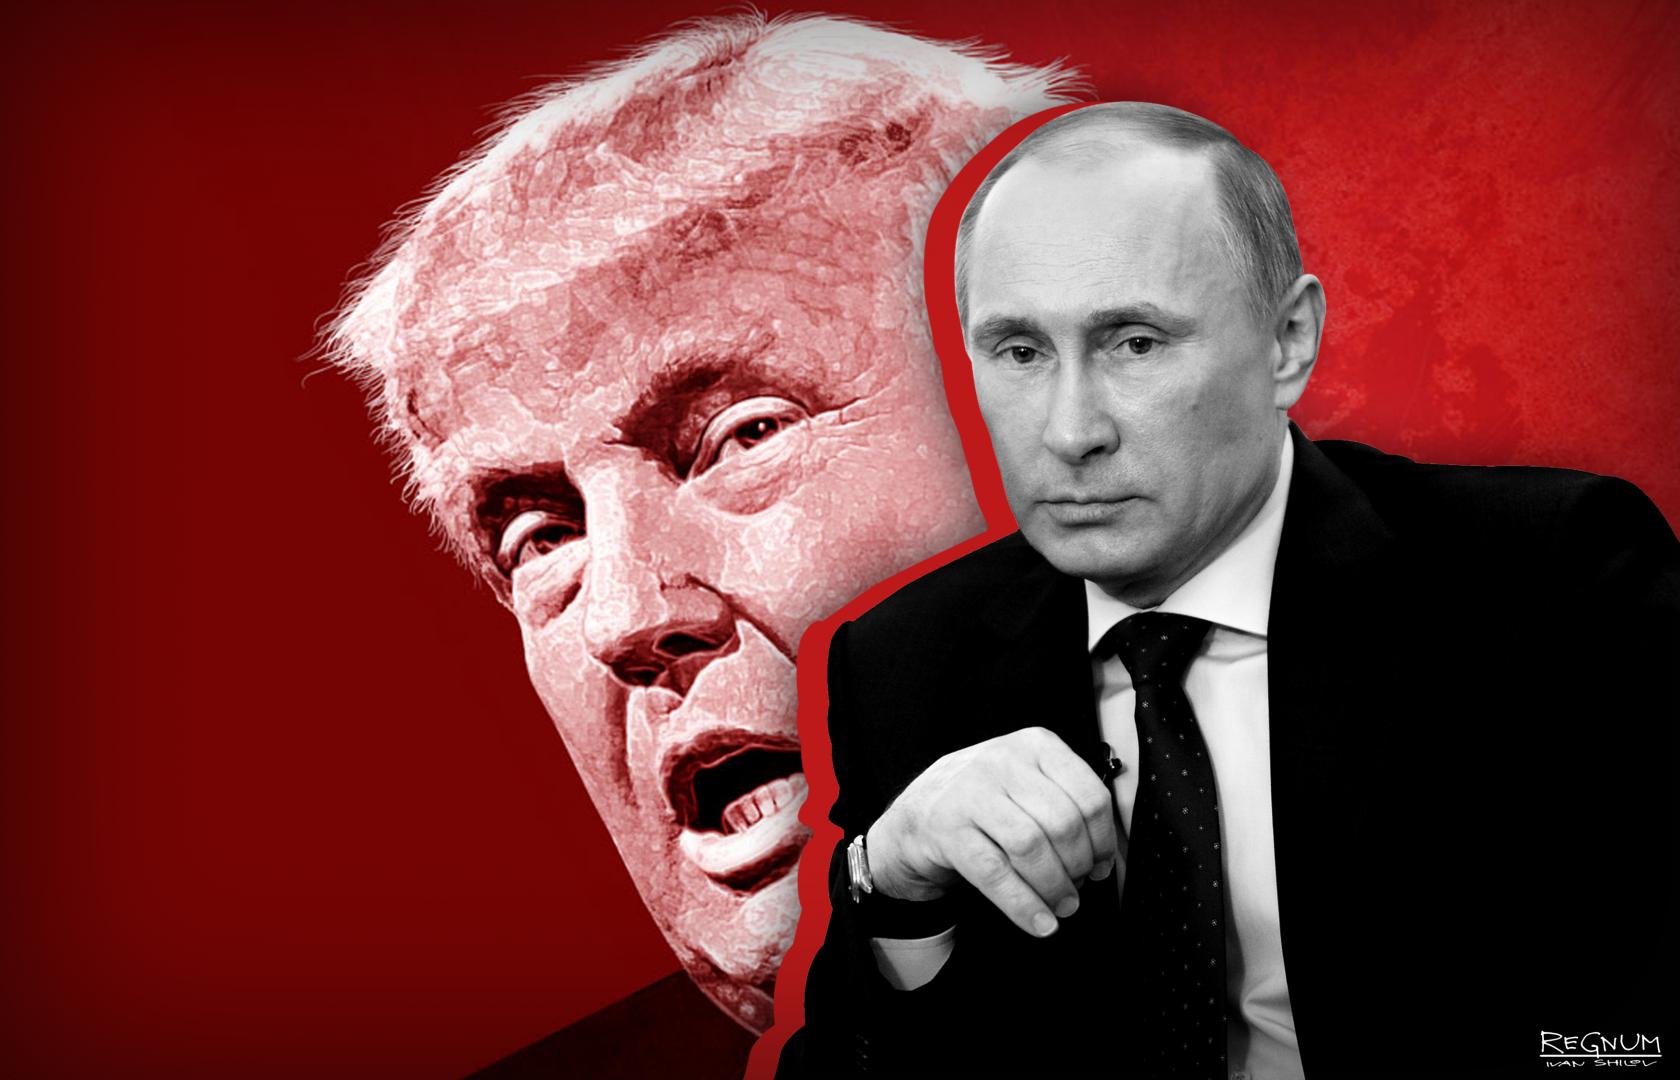 Putin/Trump (Image: Ivan Shilov, Regnum)